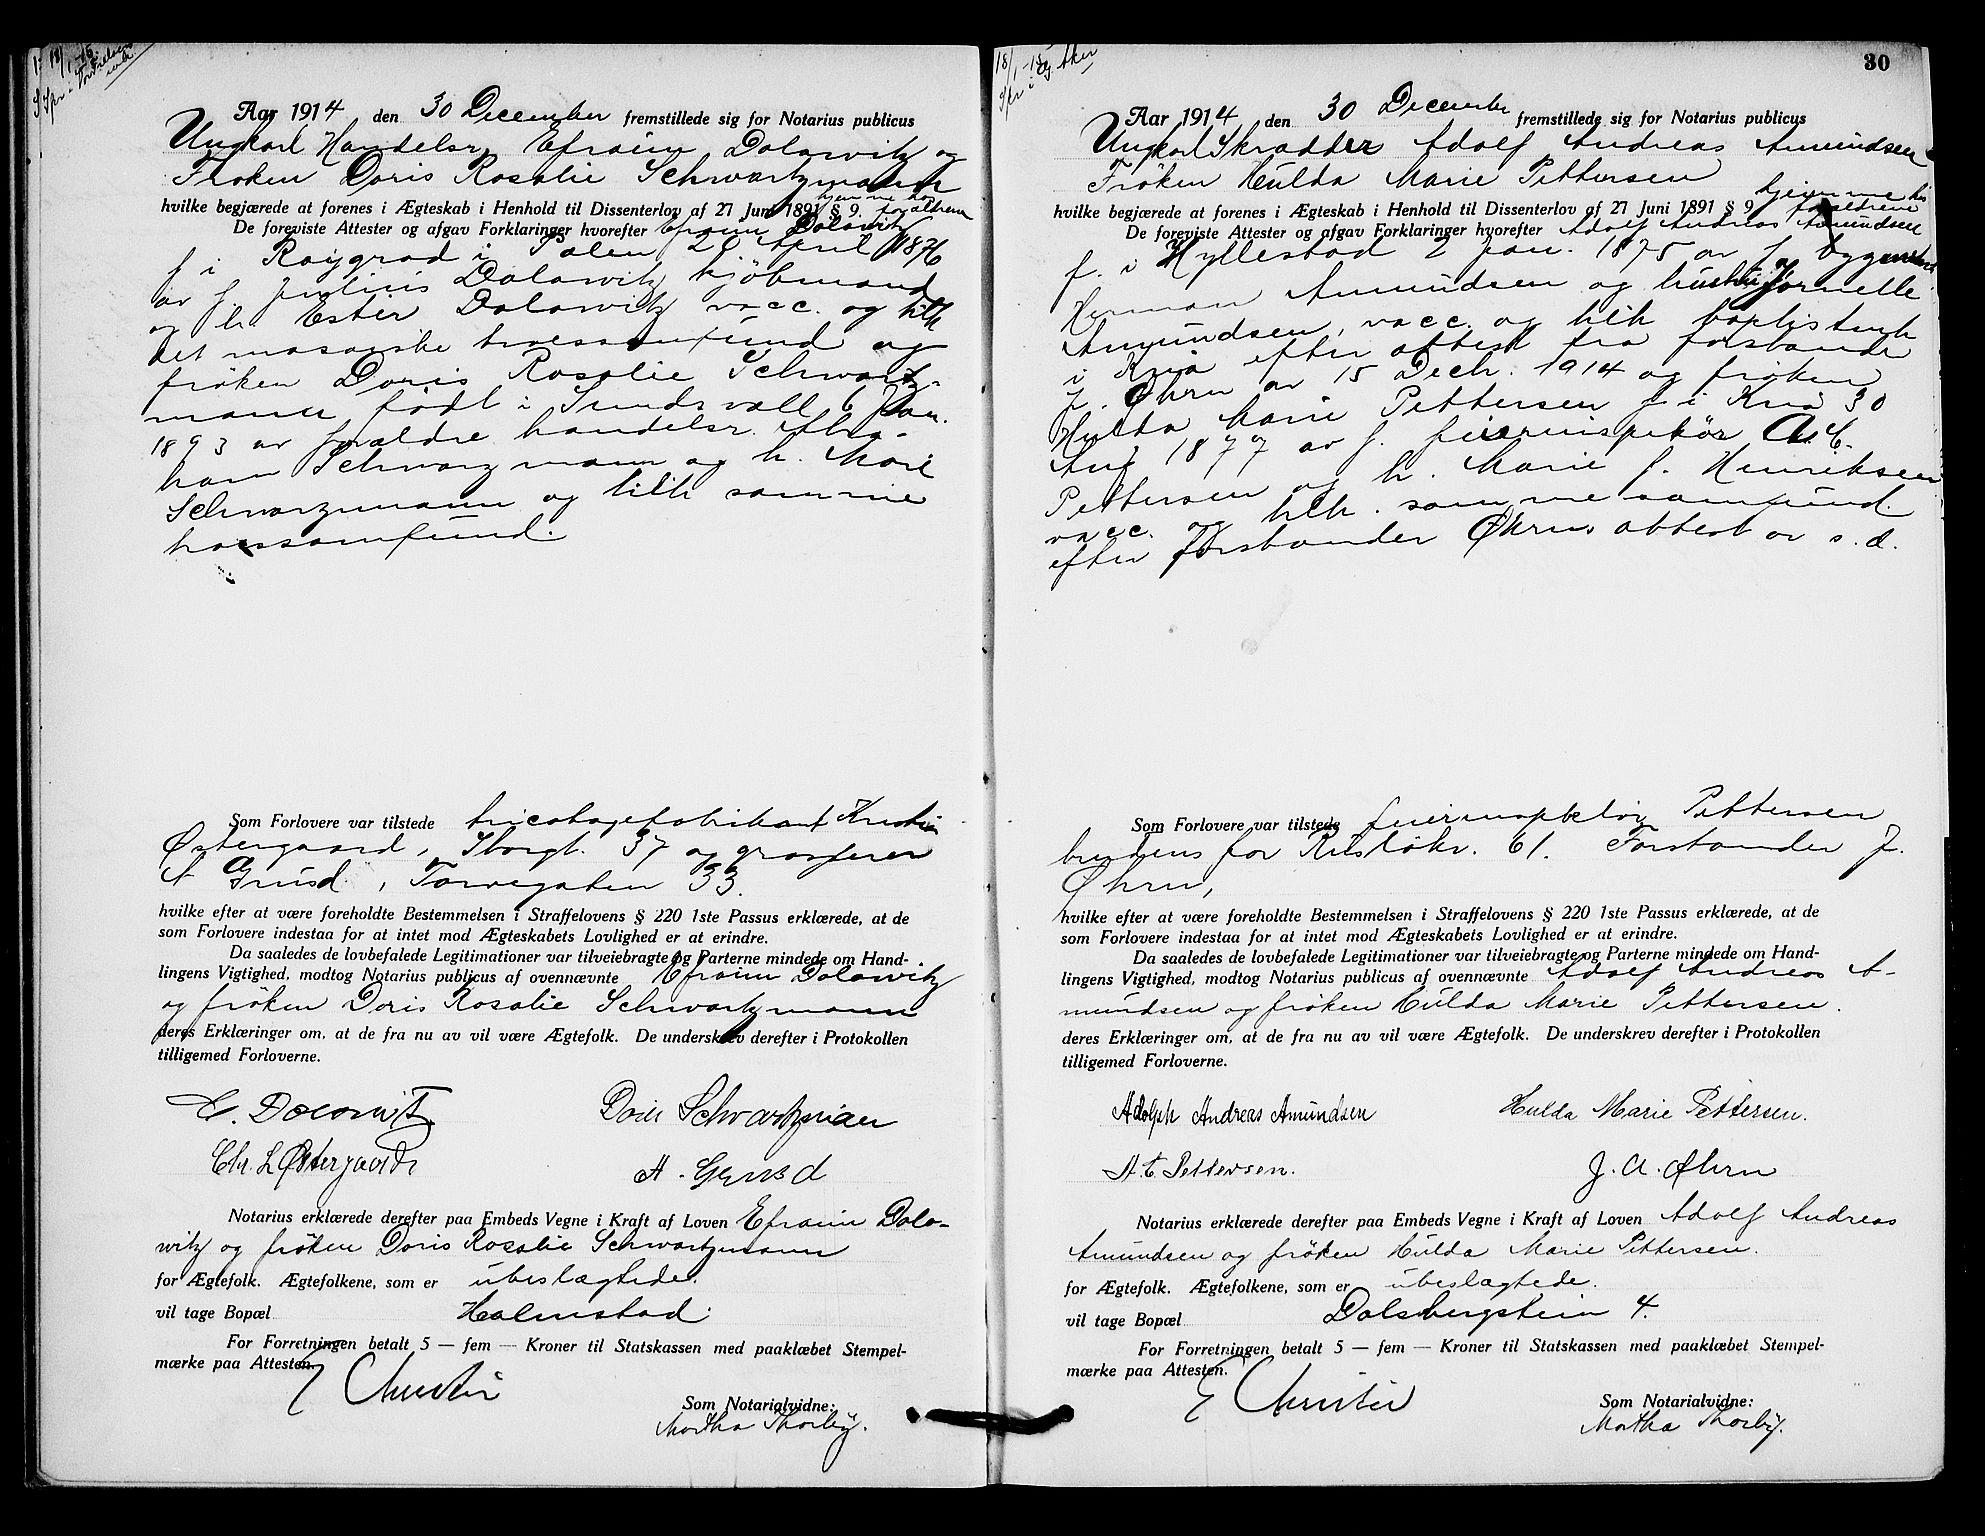 SAO, Oslo byfogd avd. I, L/Lb/Lbb/L0010: Notarialprotokoll, rekke II: Vigsler, 1914-1916, s. 29b-30a